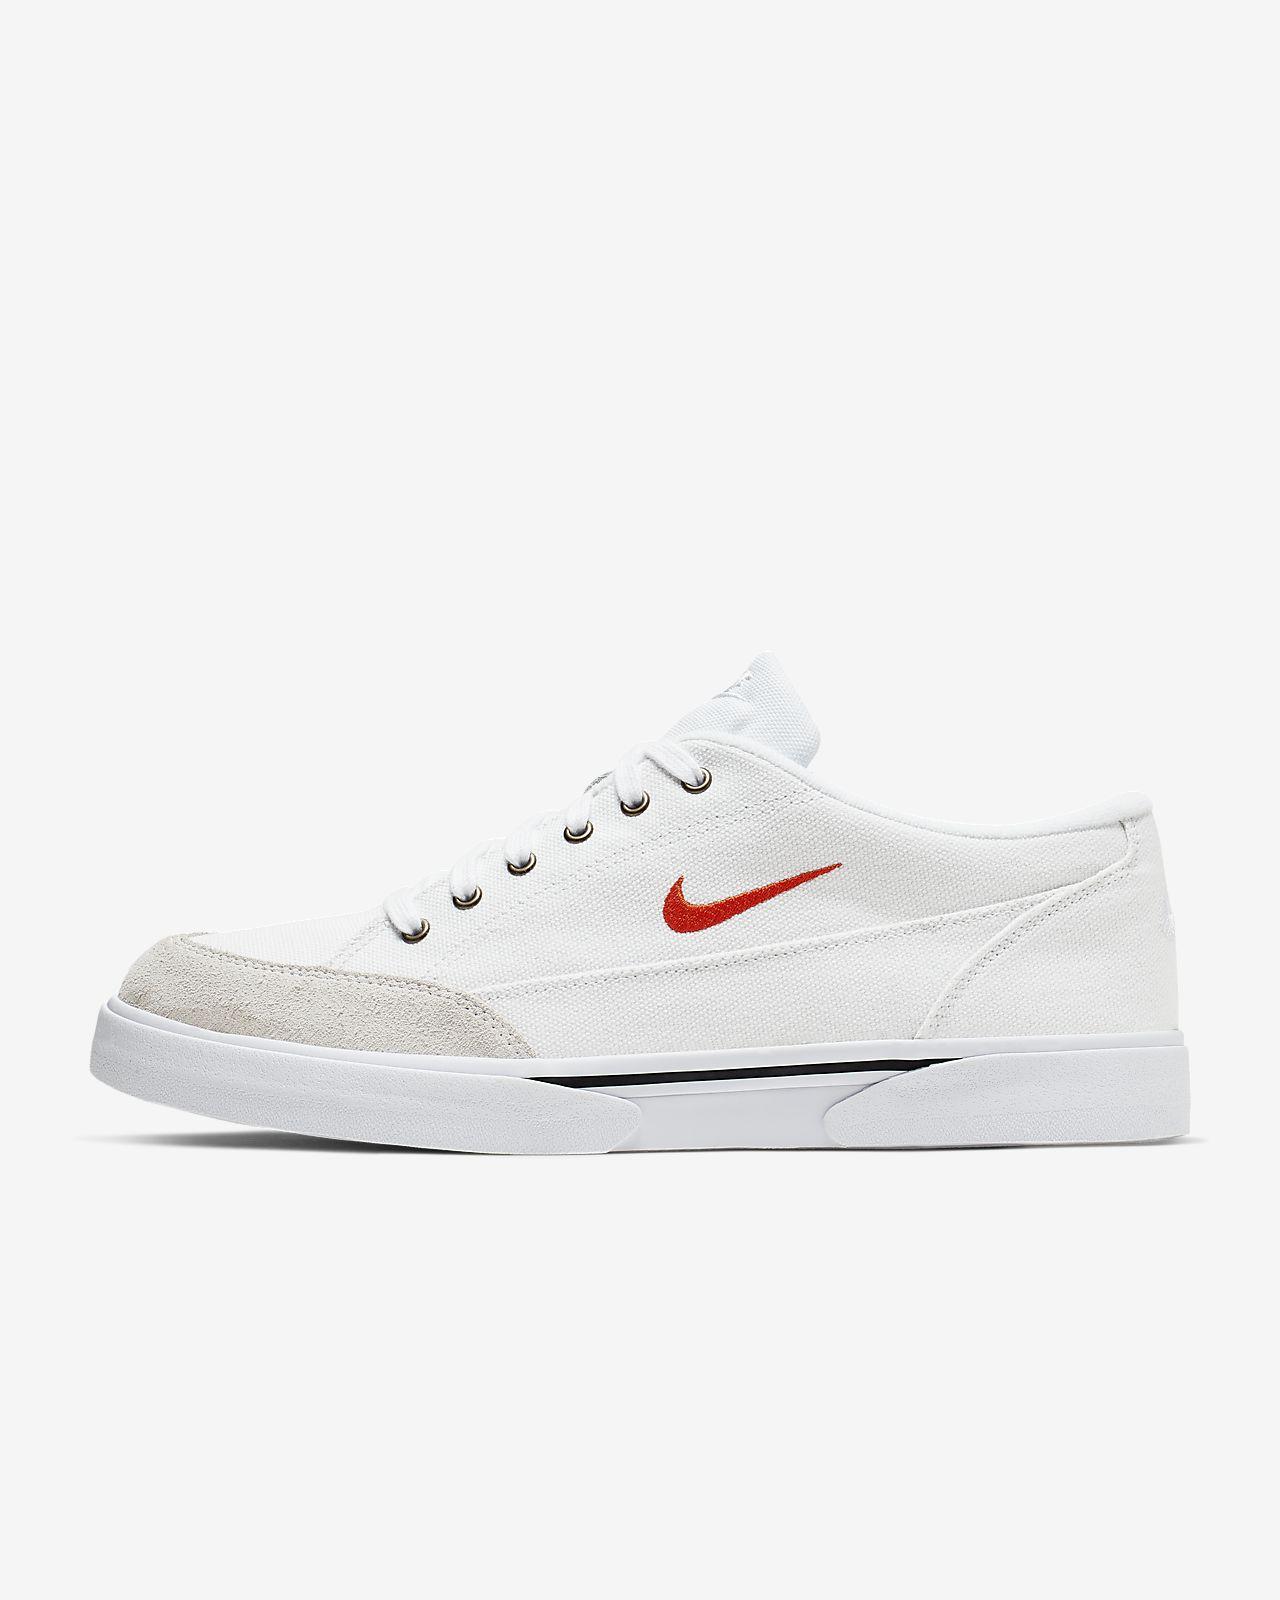 Sko Nike GTS ' 16 TXT för män